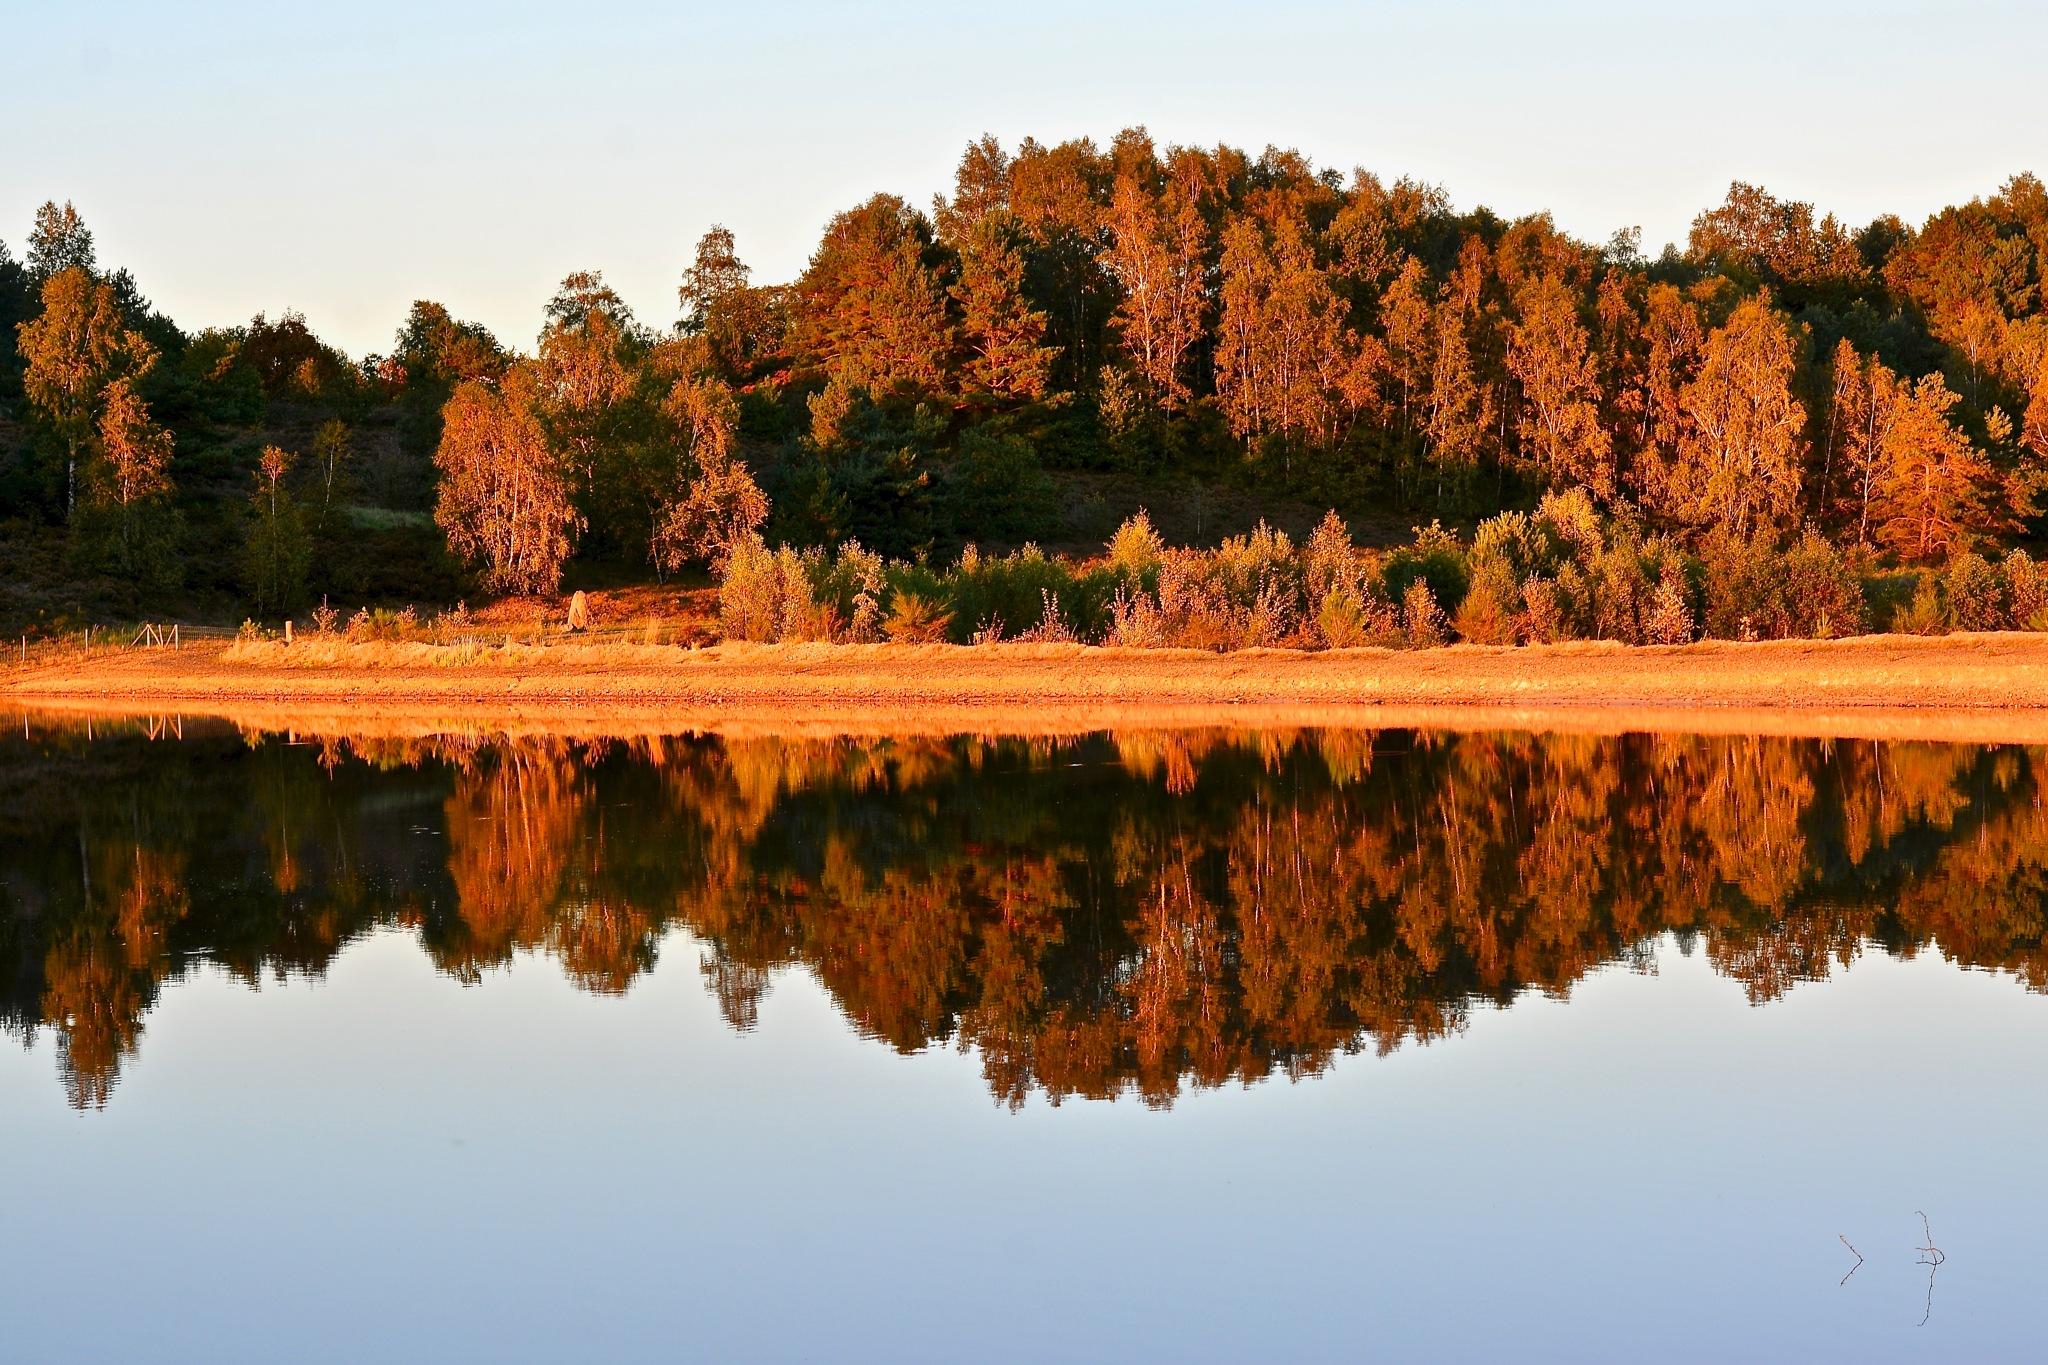 Autumn mirror by toinelenssen